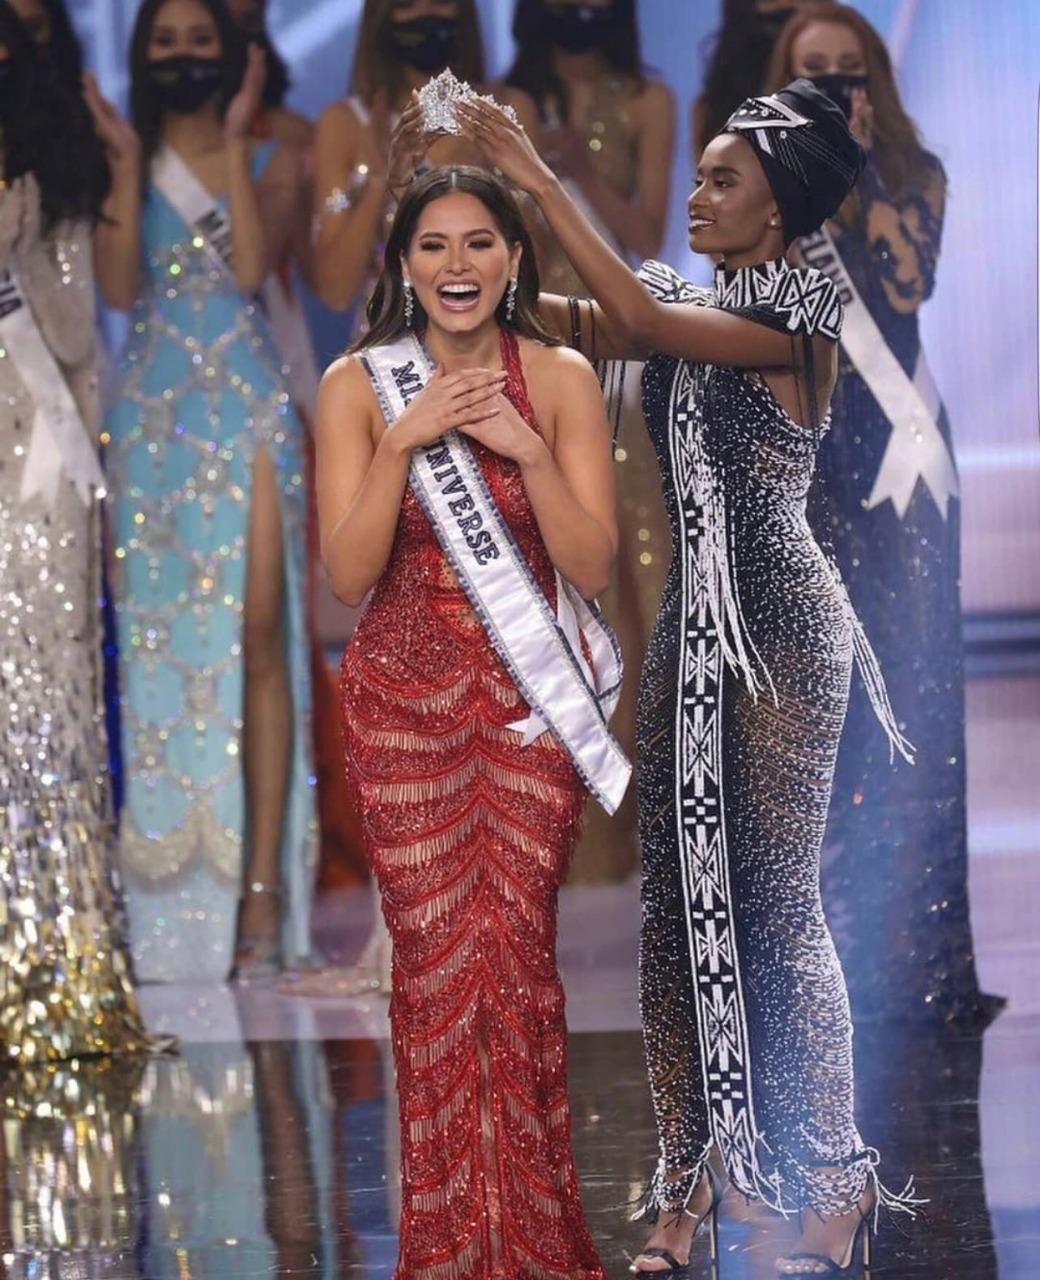 Miss Universe 2021 Adline Castelino Photos